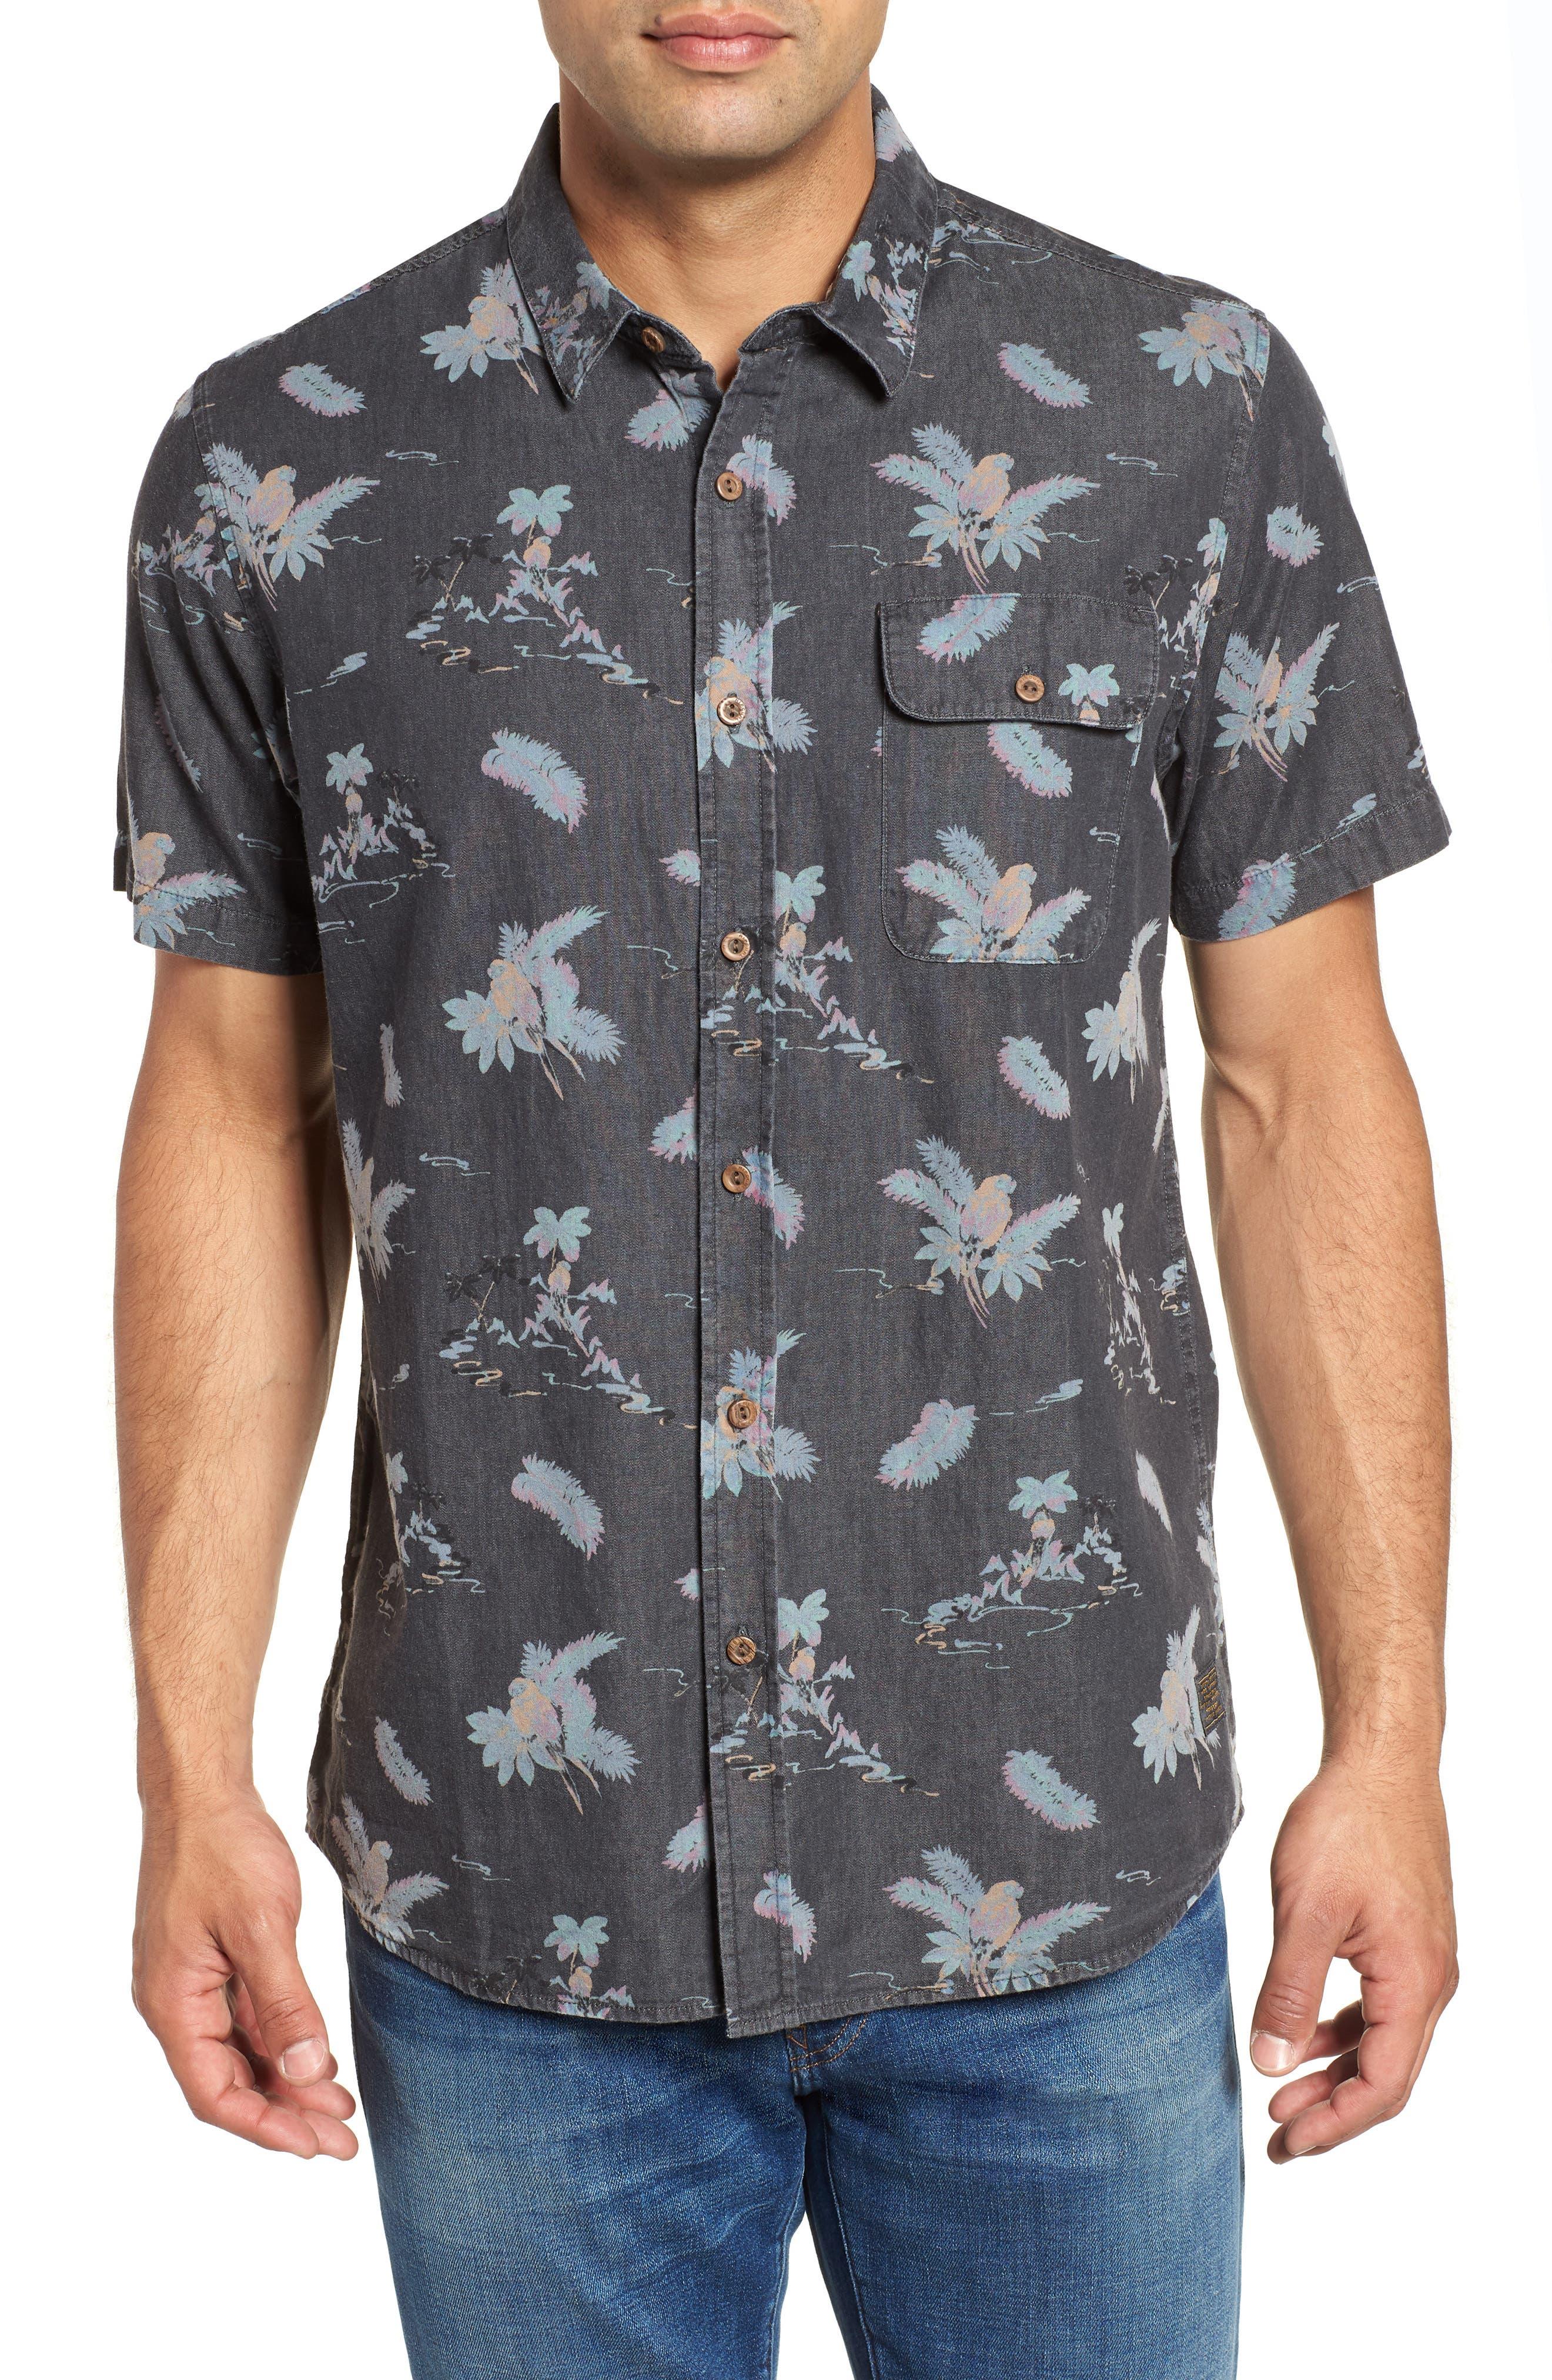 Meledrone Woven Shirt,                             Main thumbnail 1, color,                             Charcoal Grey